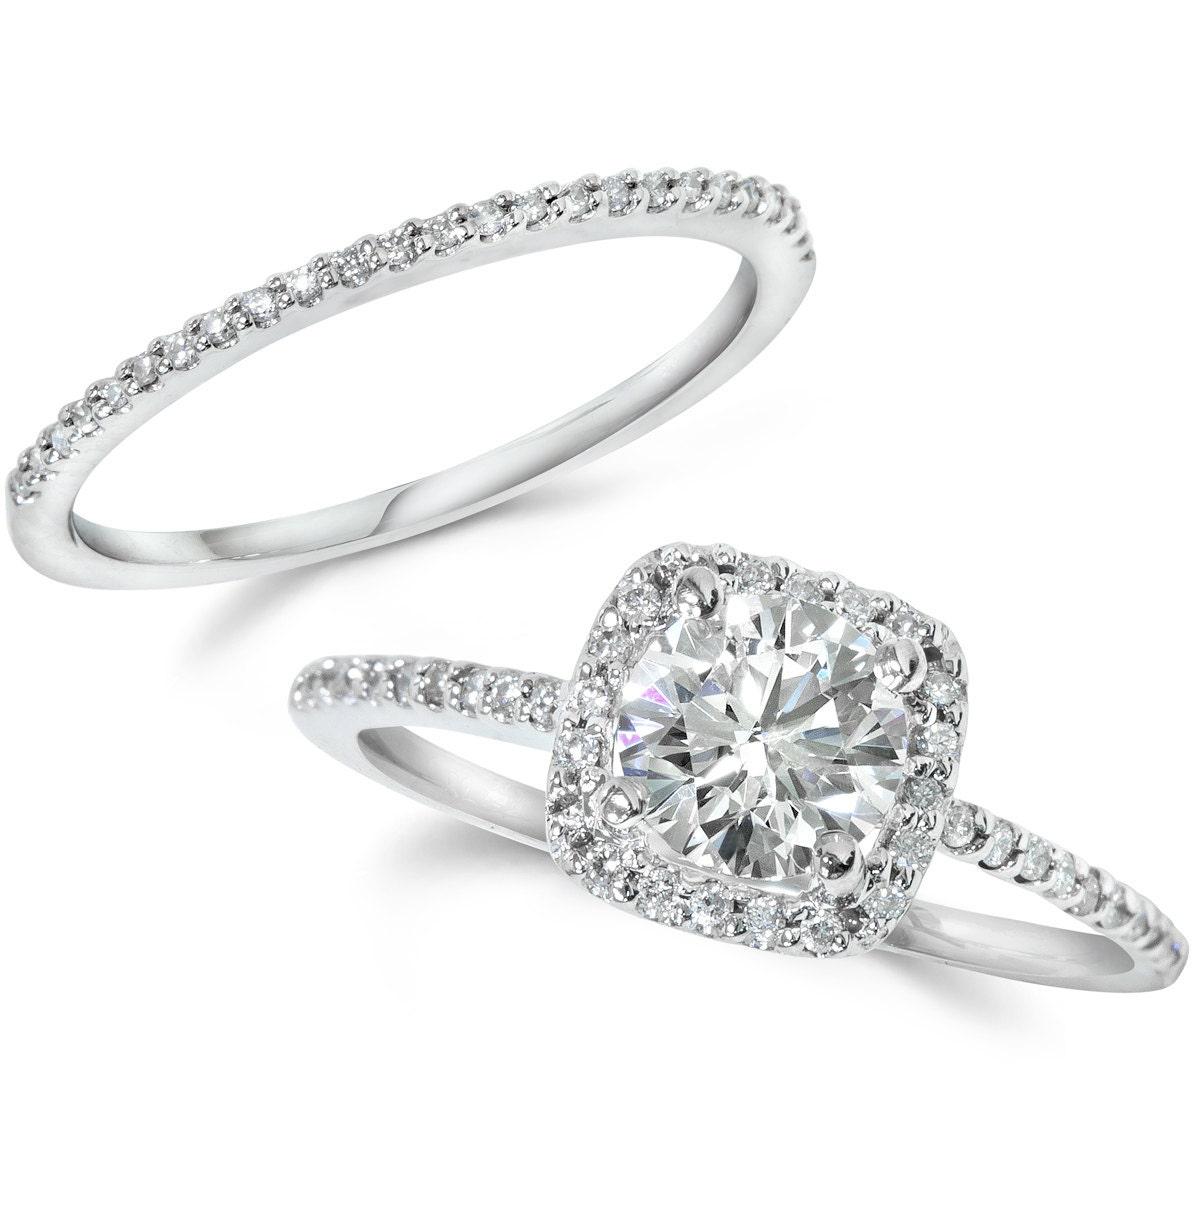 diamond engagement ring cushion halo set solid 14 kt white. Black Bedroom Furniture Sets. Home Design Ideas